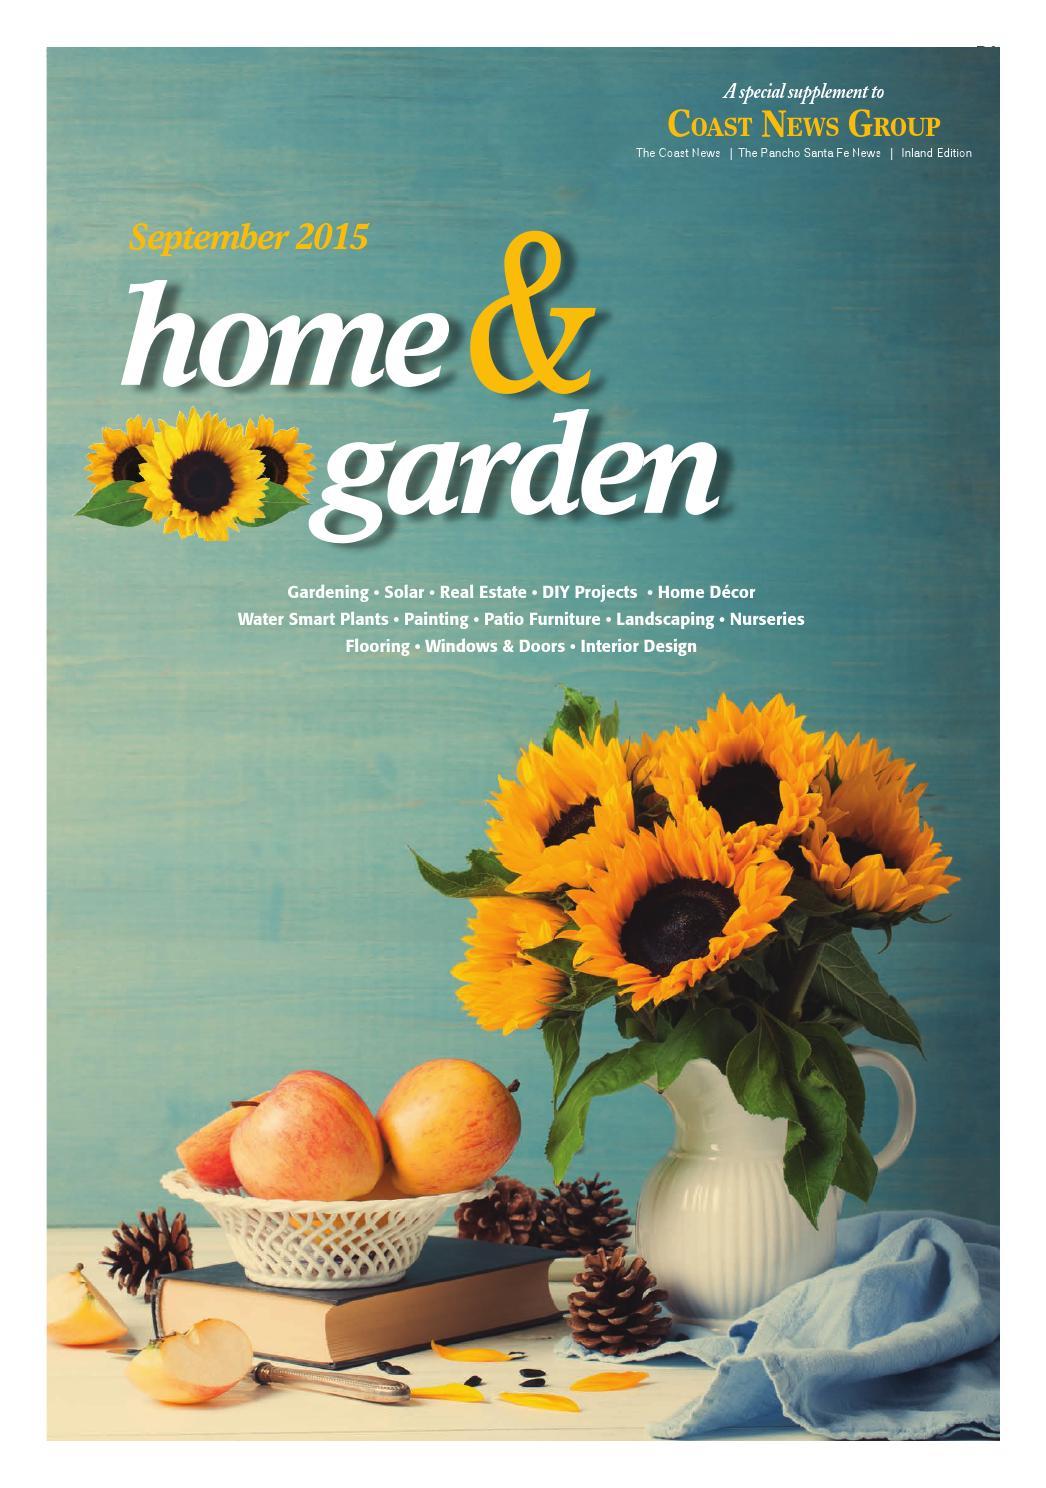 Fall Home Amp Garden 2015 By Coast News Group Issuu